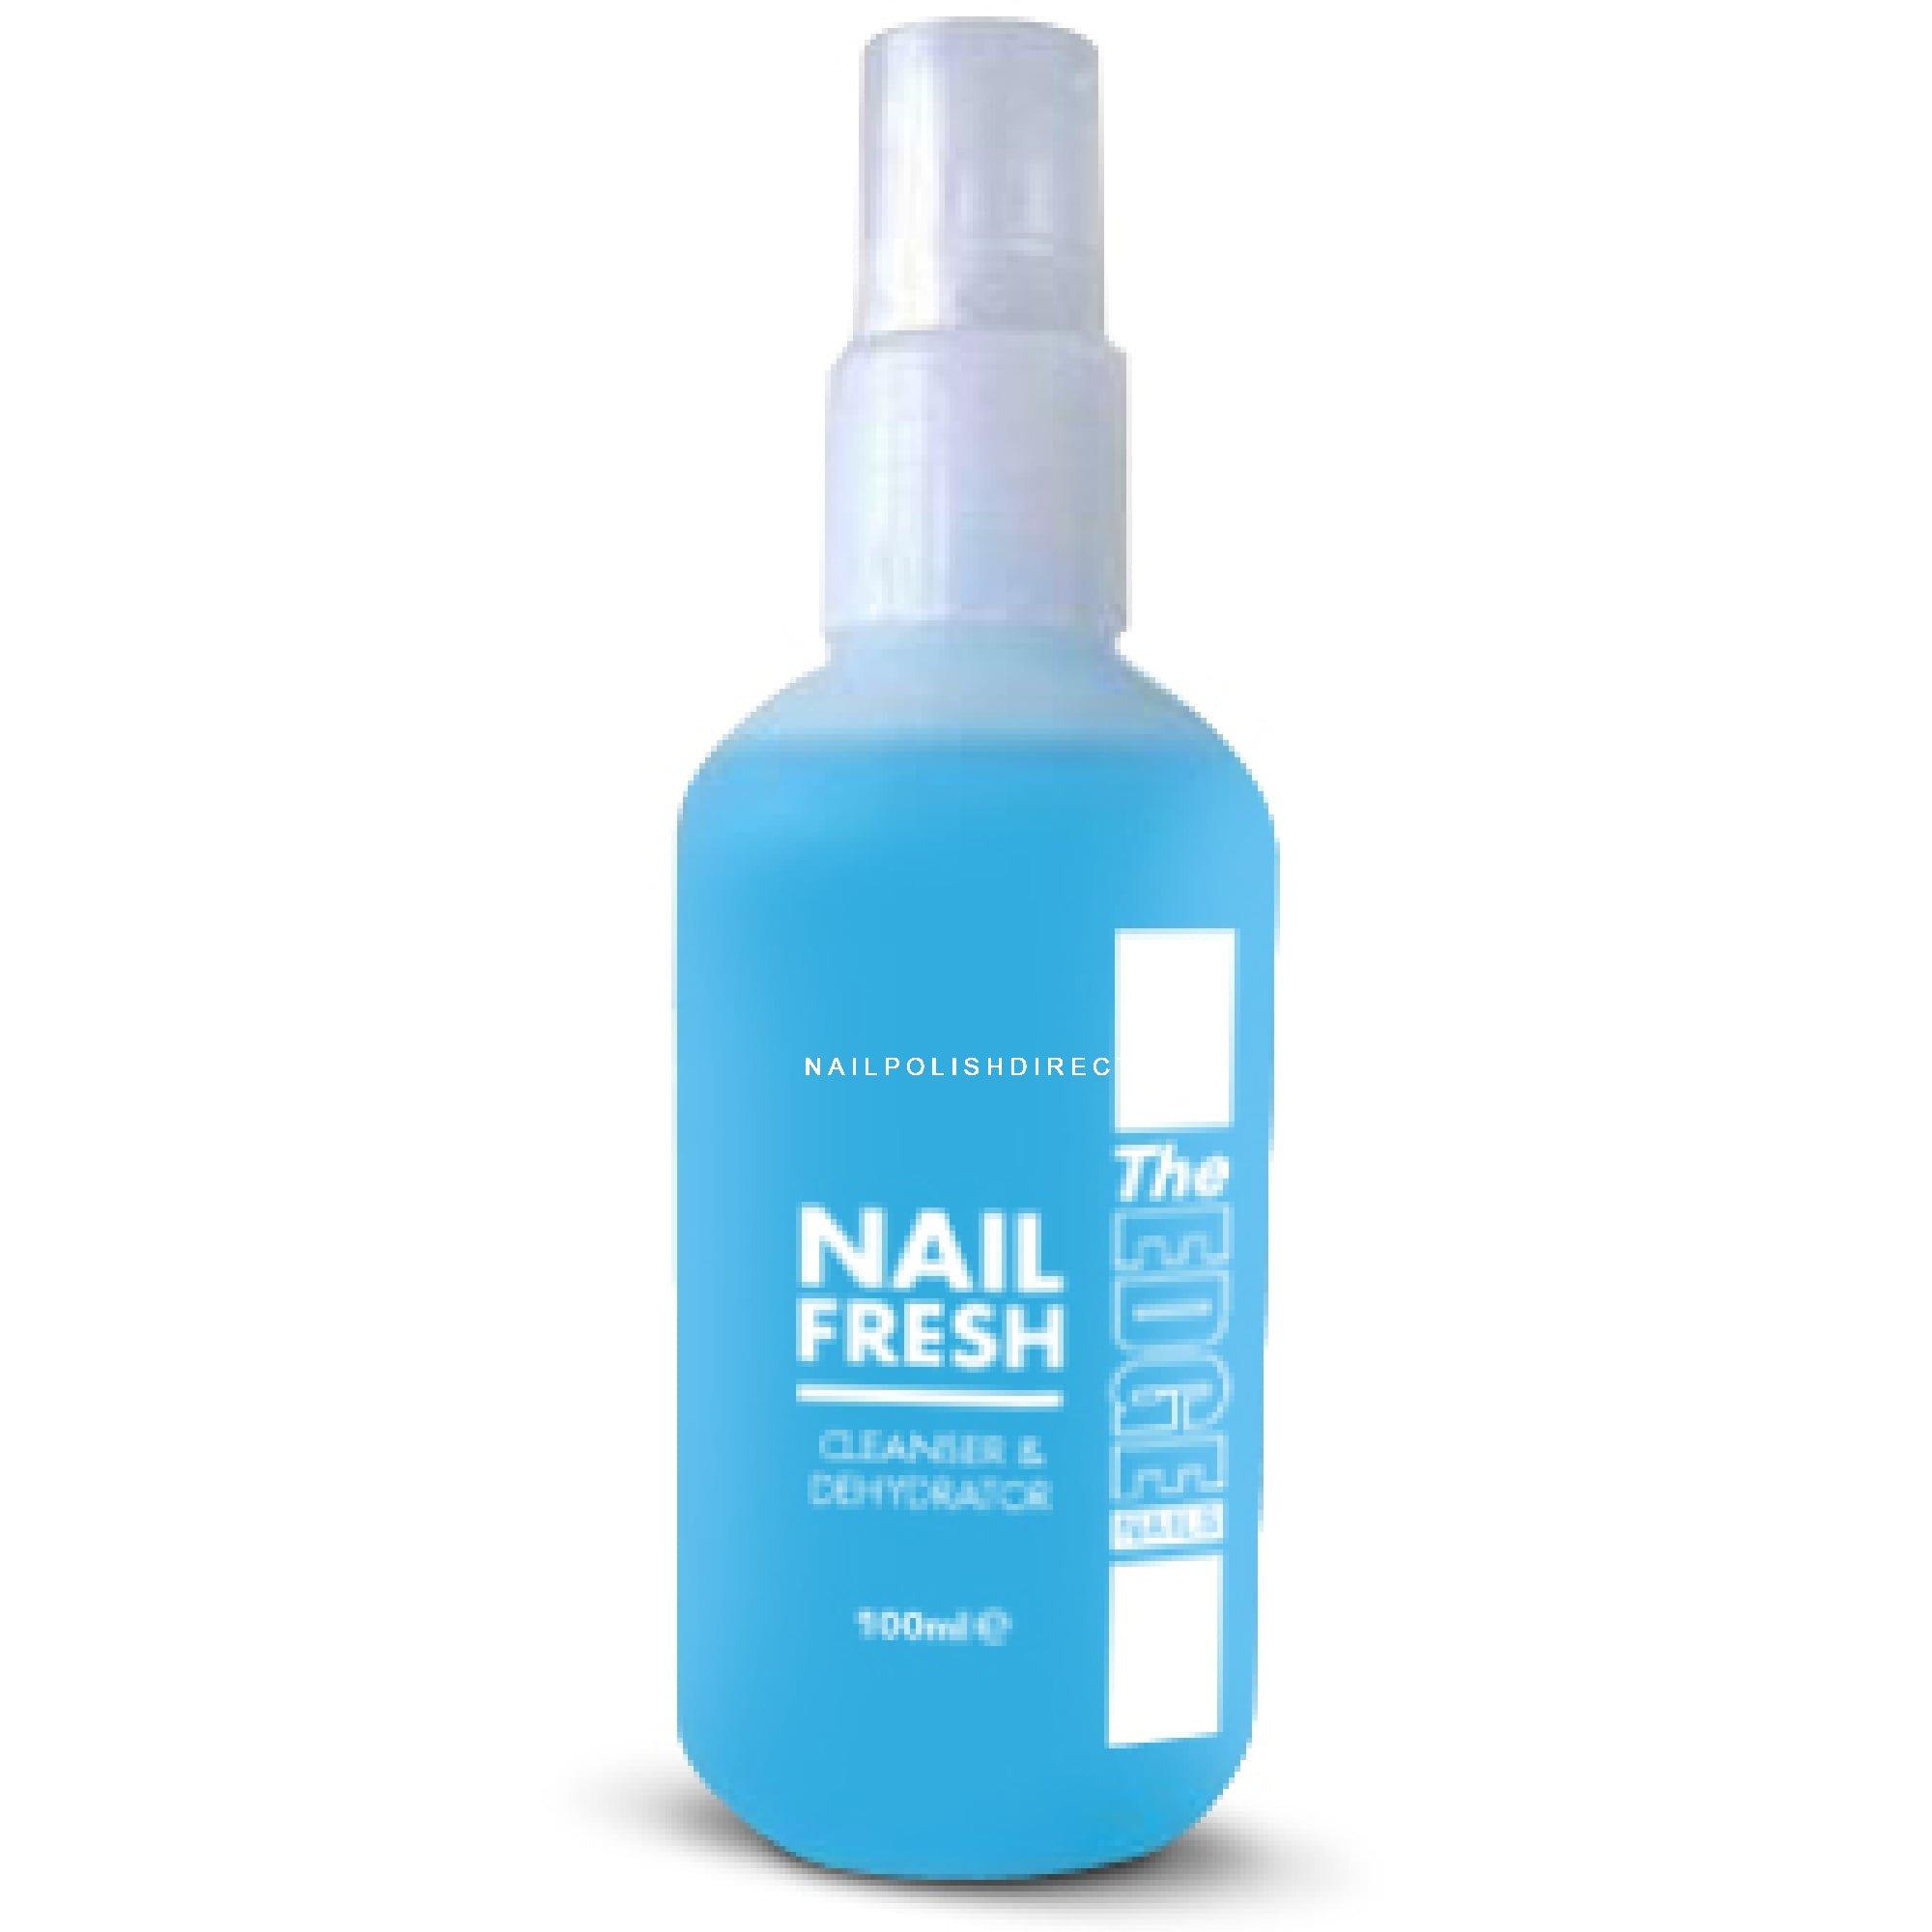 Edge Nails Nail Fresh Cleanser Dehydrator 100ml at Nail Polish Direct